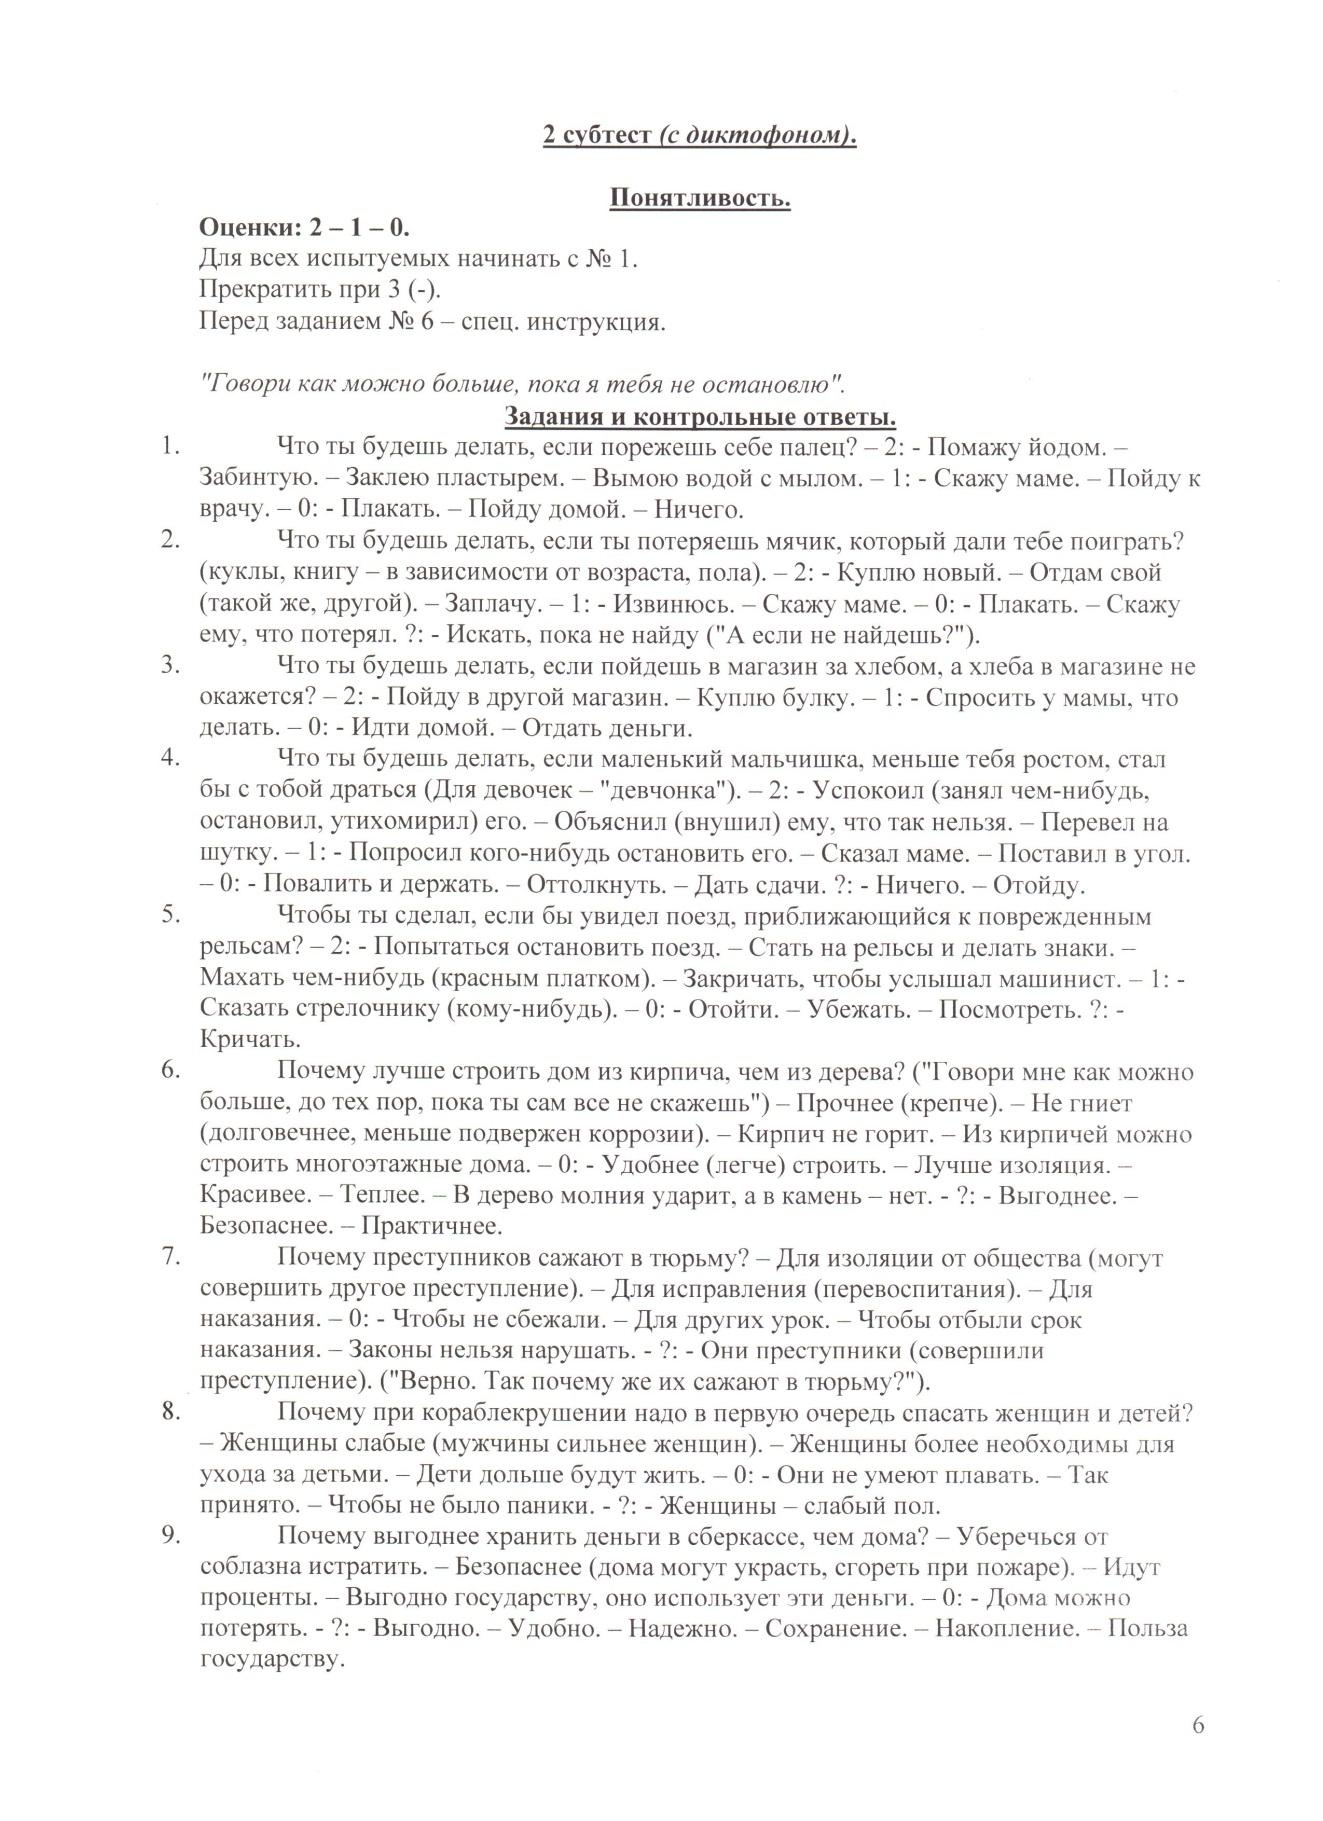 C:\Users\Пользователь\Pictures\2013-06-30\019.jpg